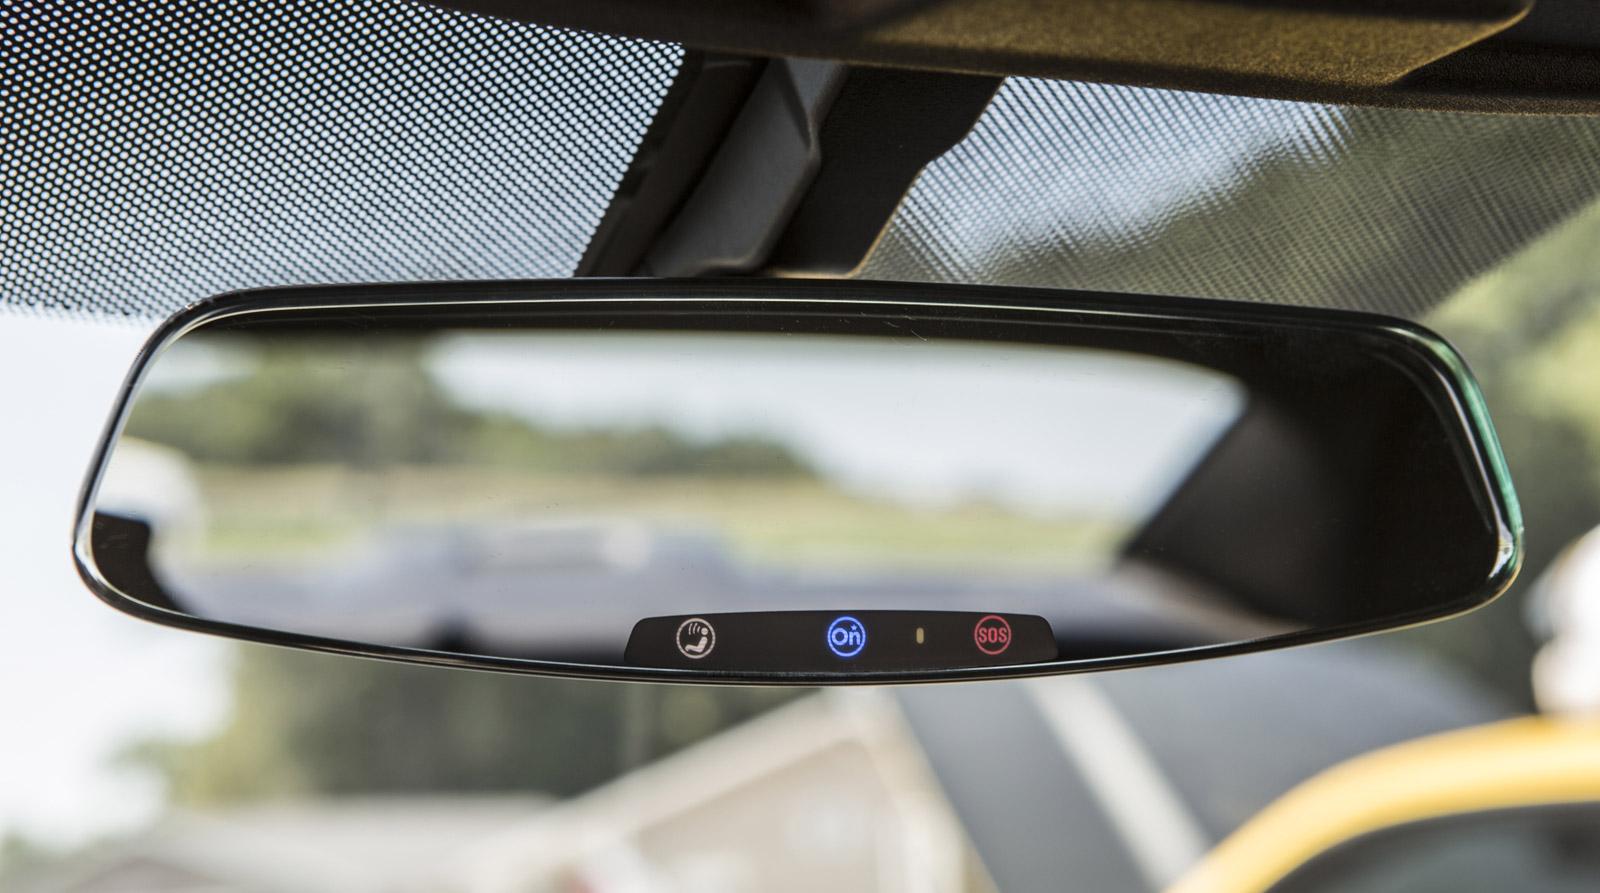 onstar wiring diagram dodge ram 1500 serpentine belt 2013 chevy camaro gets frameless rear-view mirror in revamp